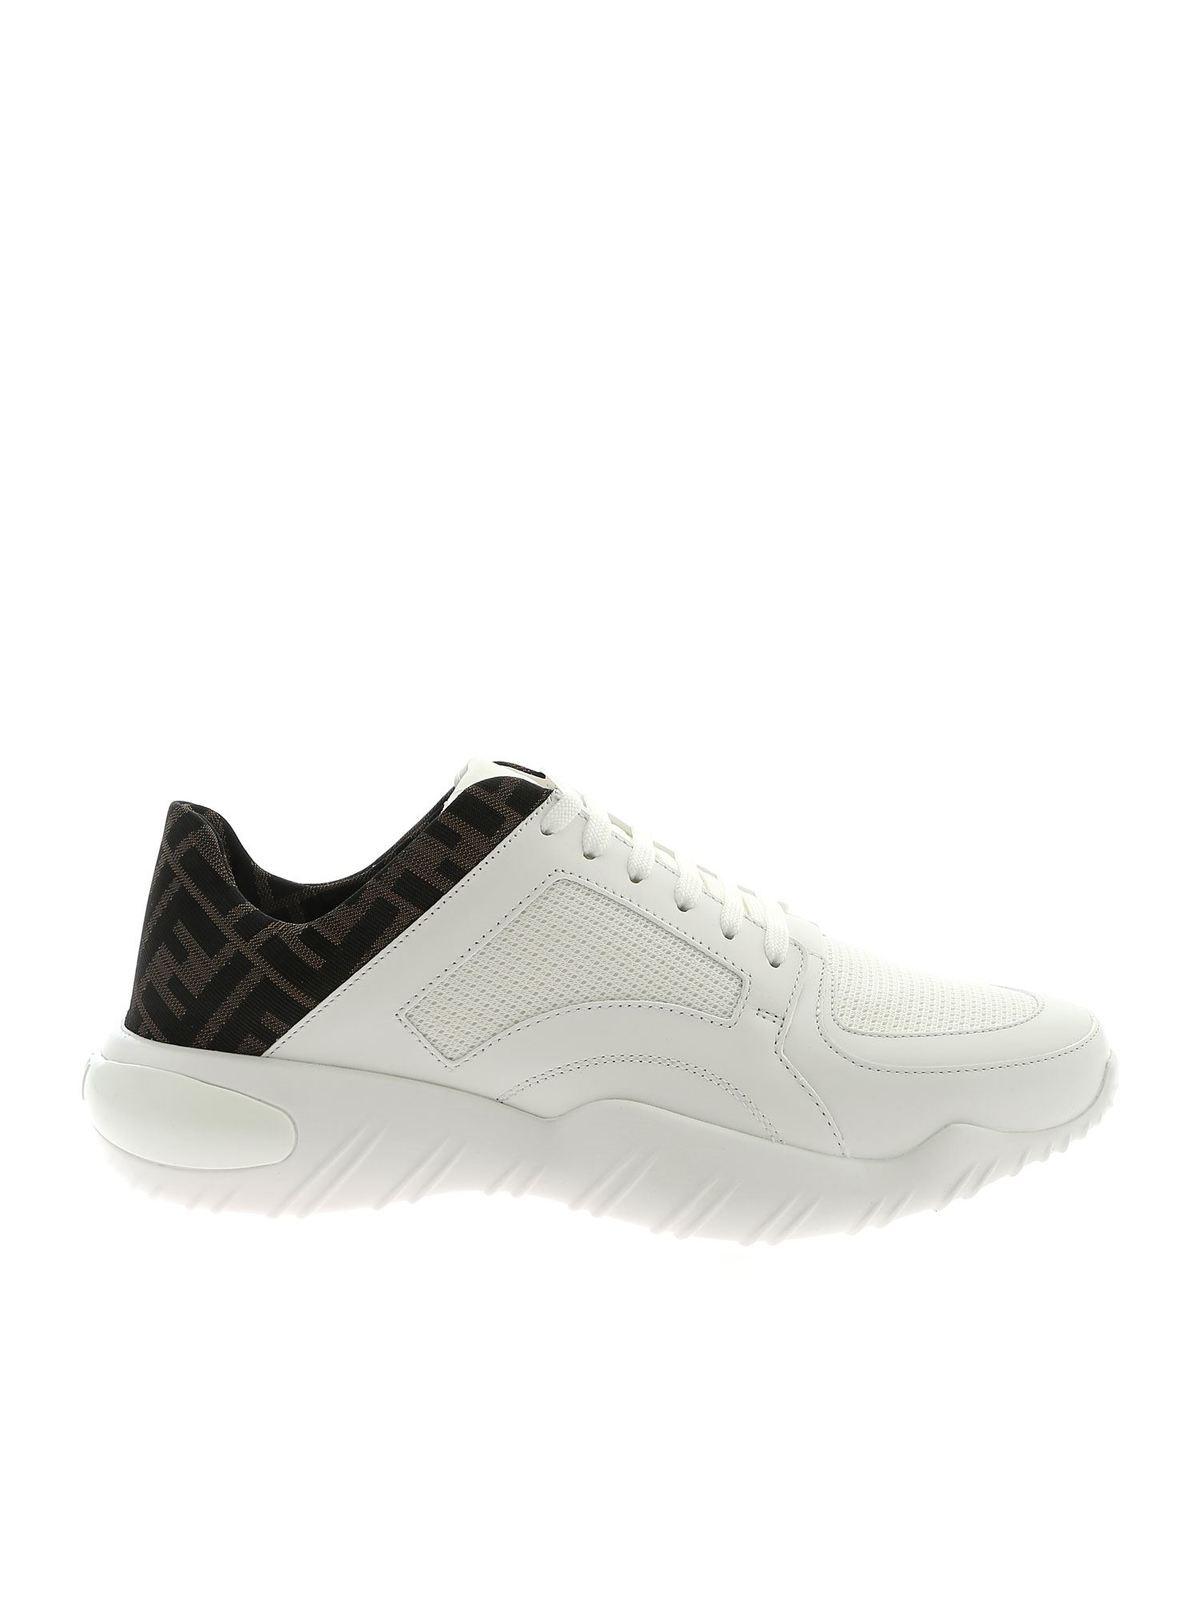 Fendi Sneakers LOGO SNEAKERS IN WHITE